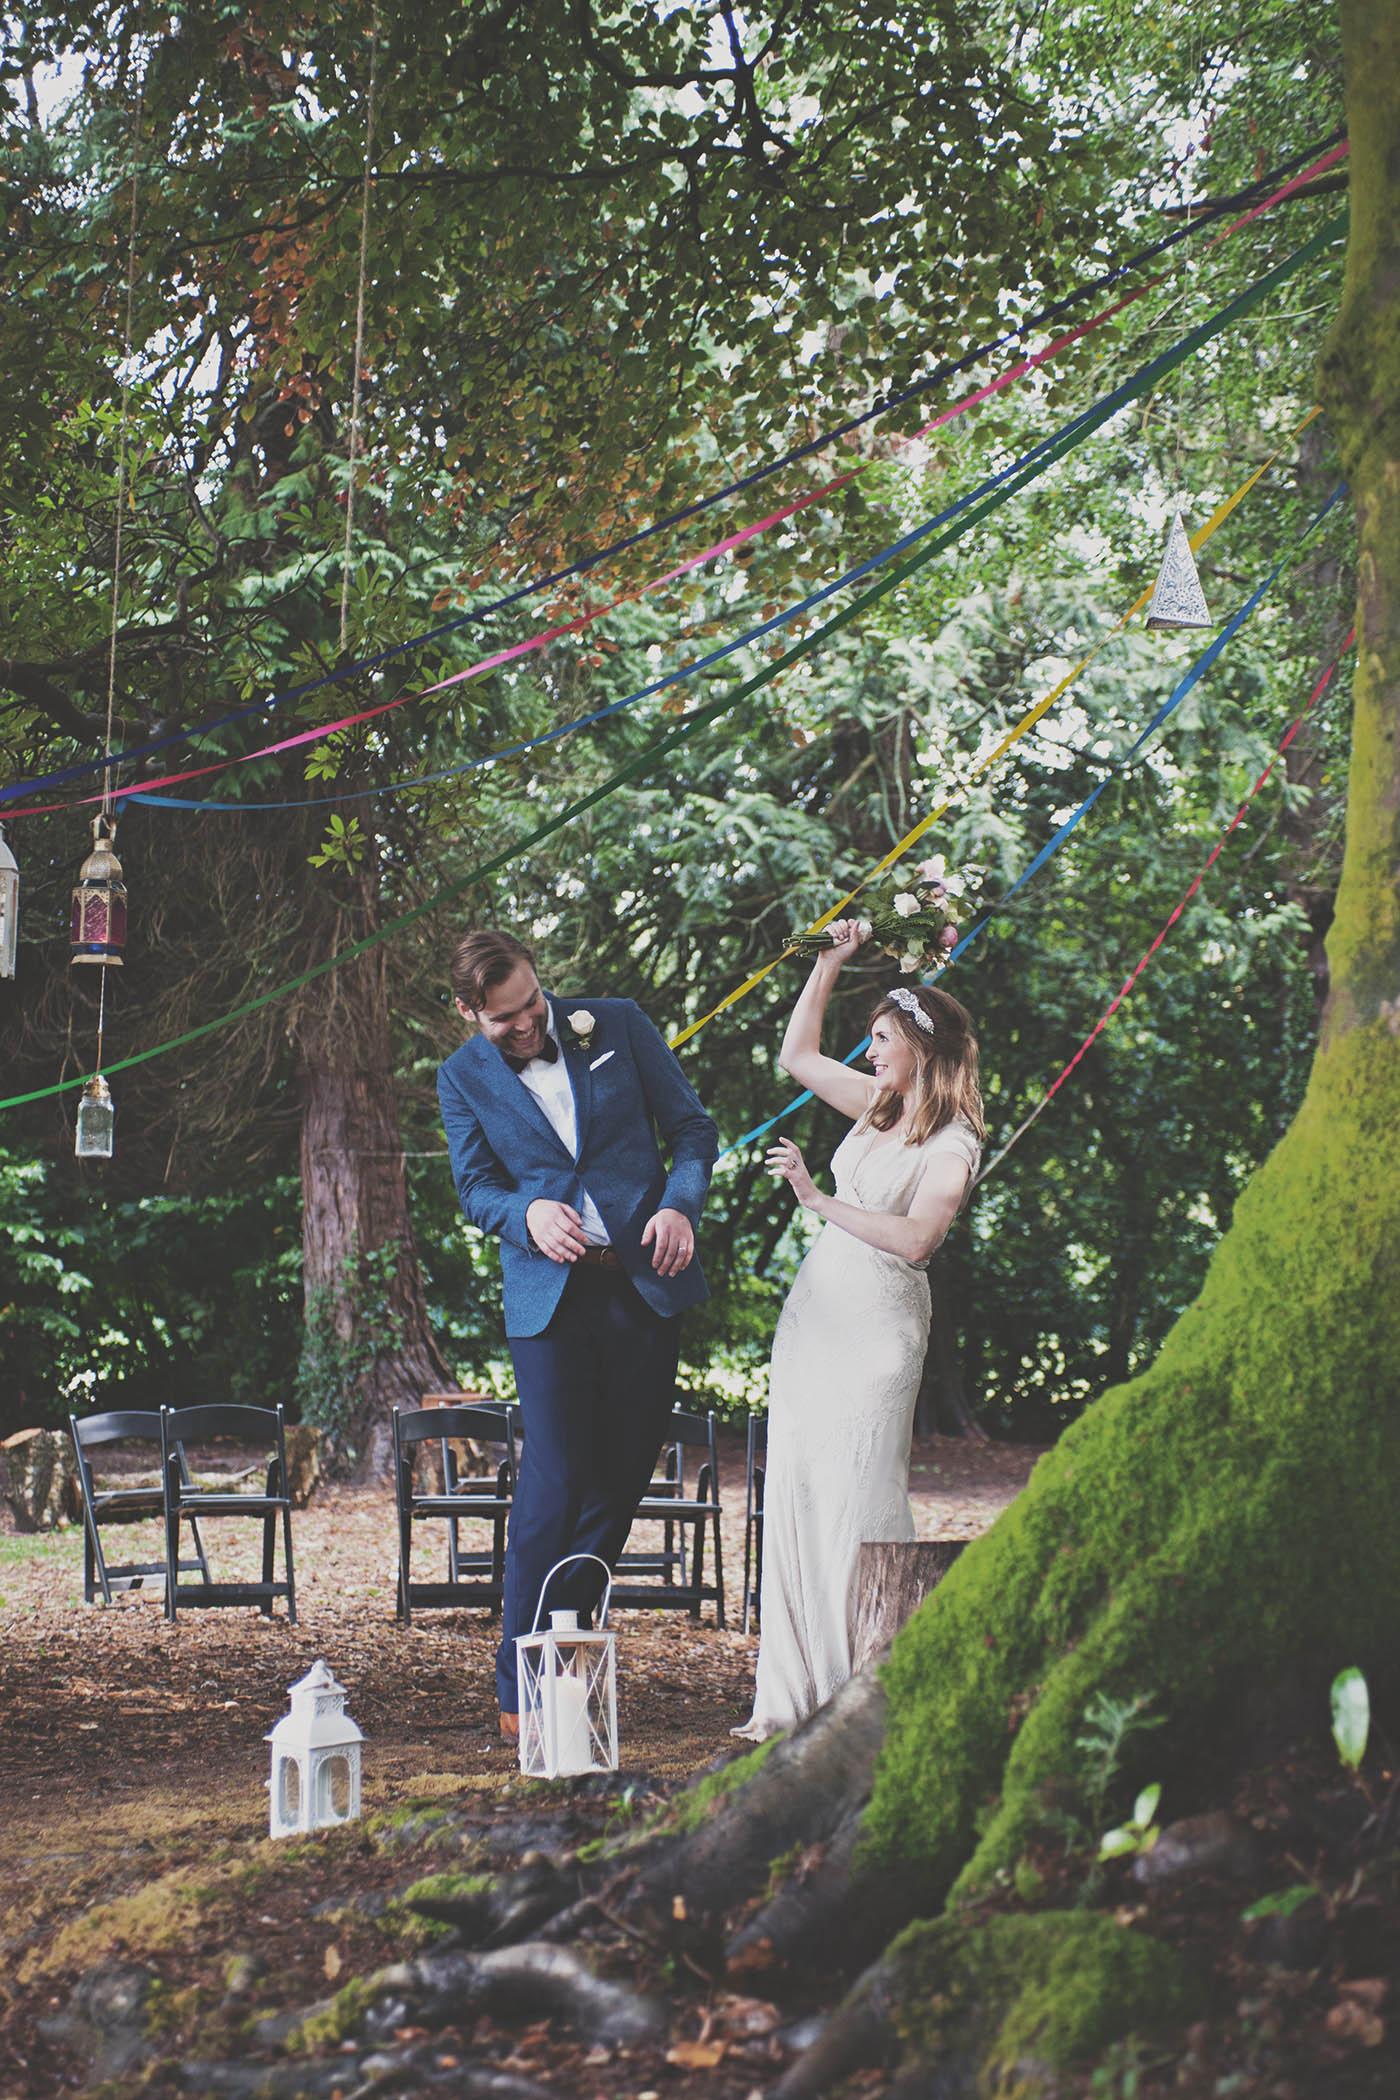 Trudder Lodge wedding photography